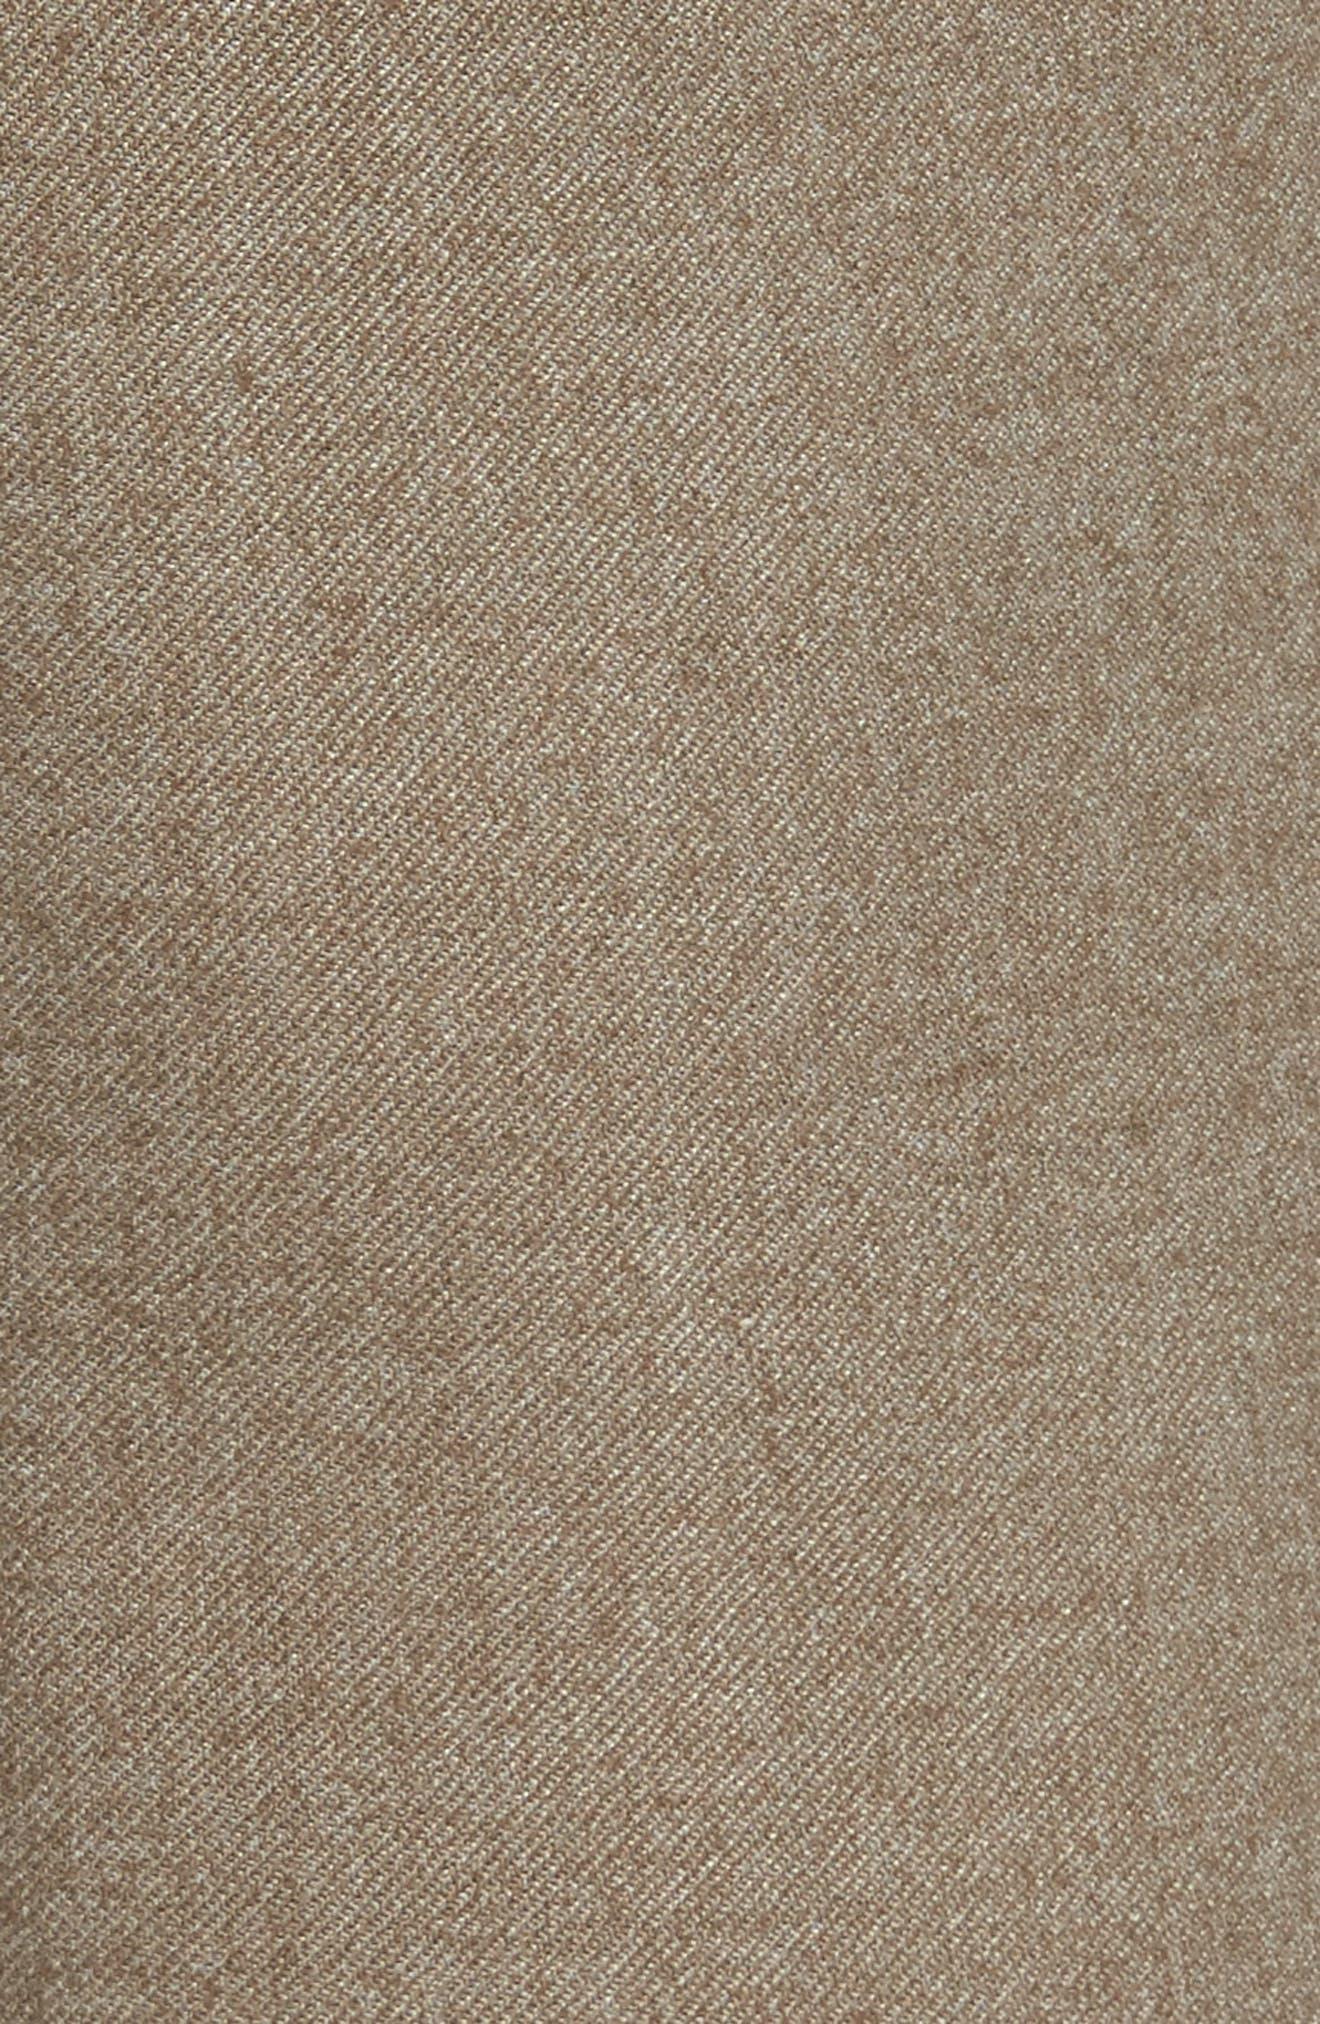 Wool Blend Pants,                             Alternate thumbnail 5, color,                             208